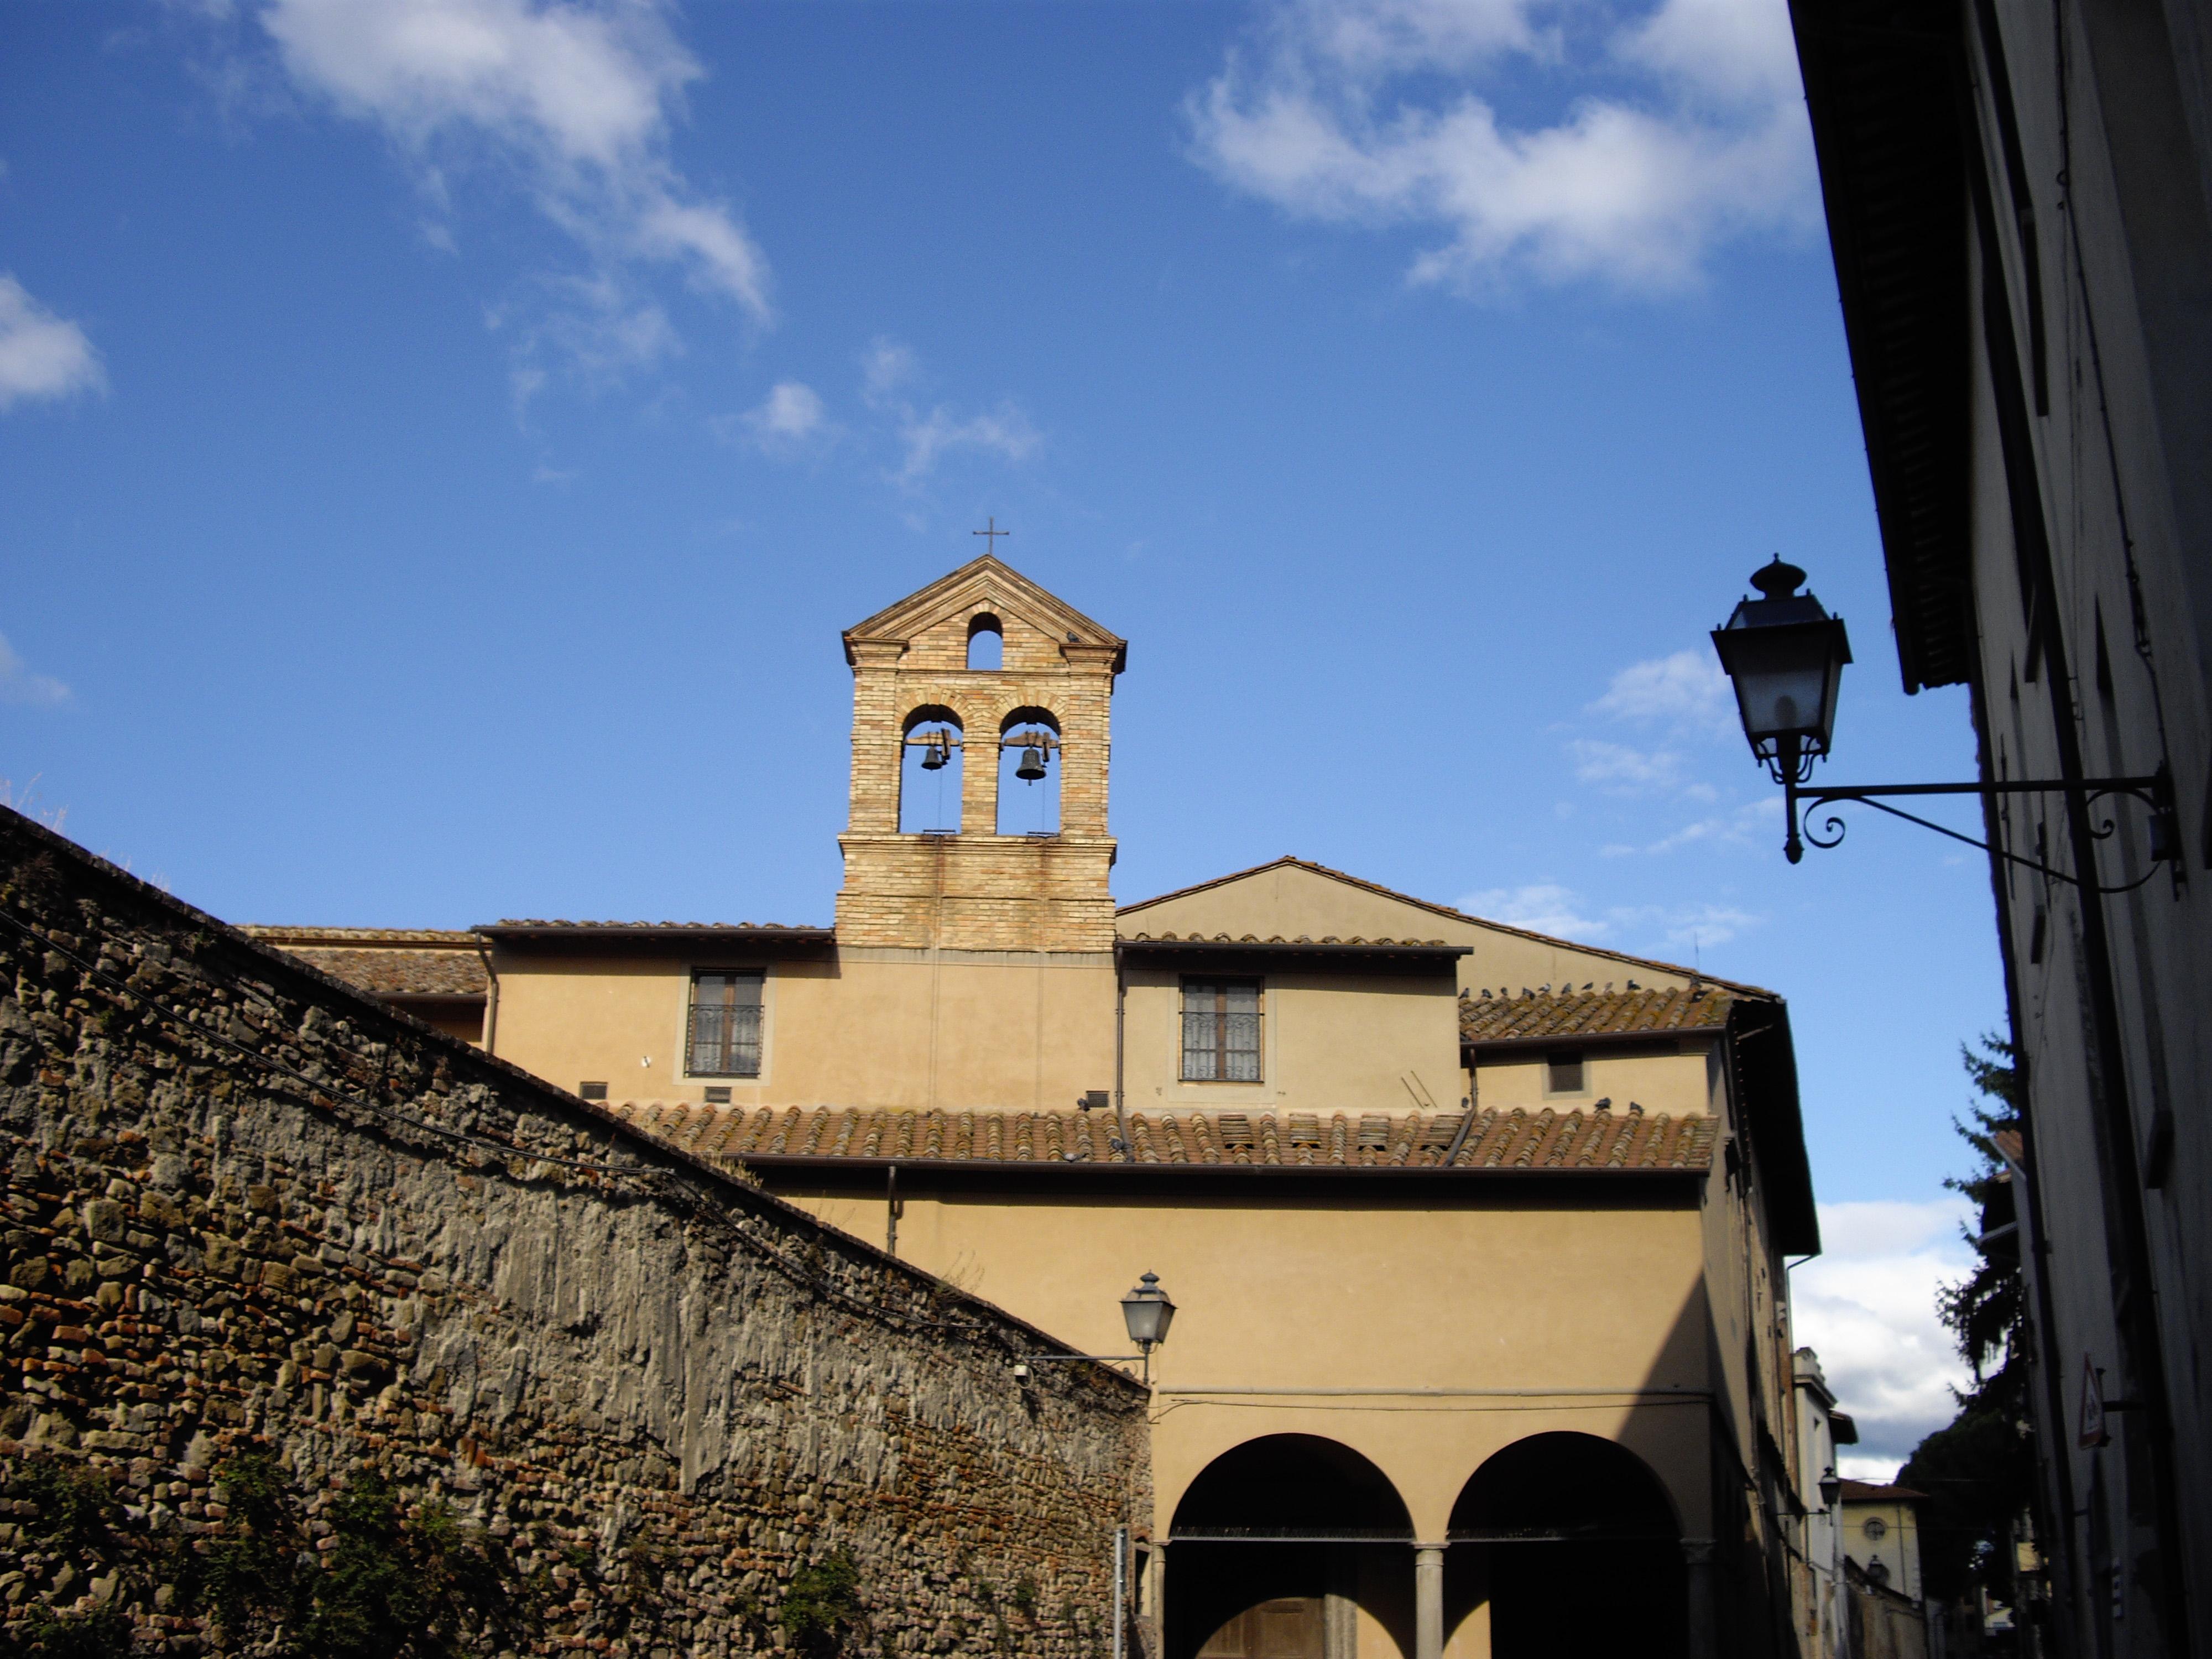 Sansepolcro church walls and bells.jpg